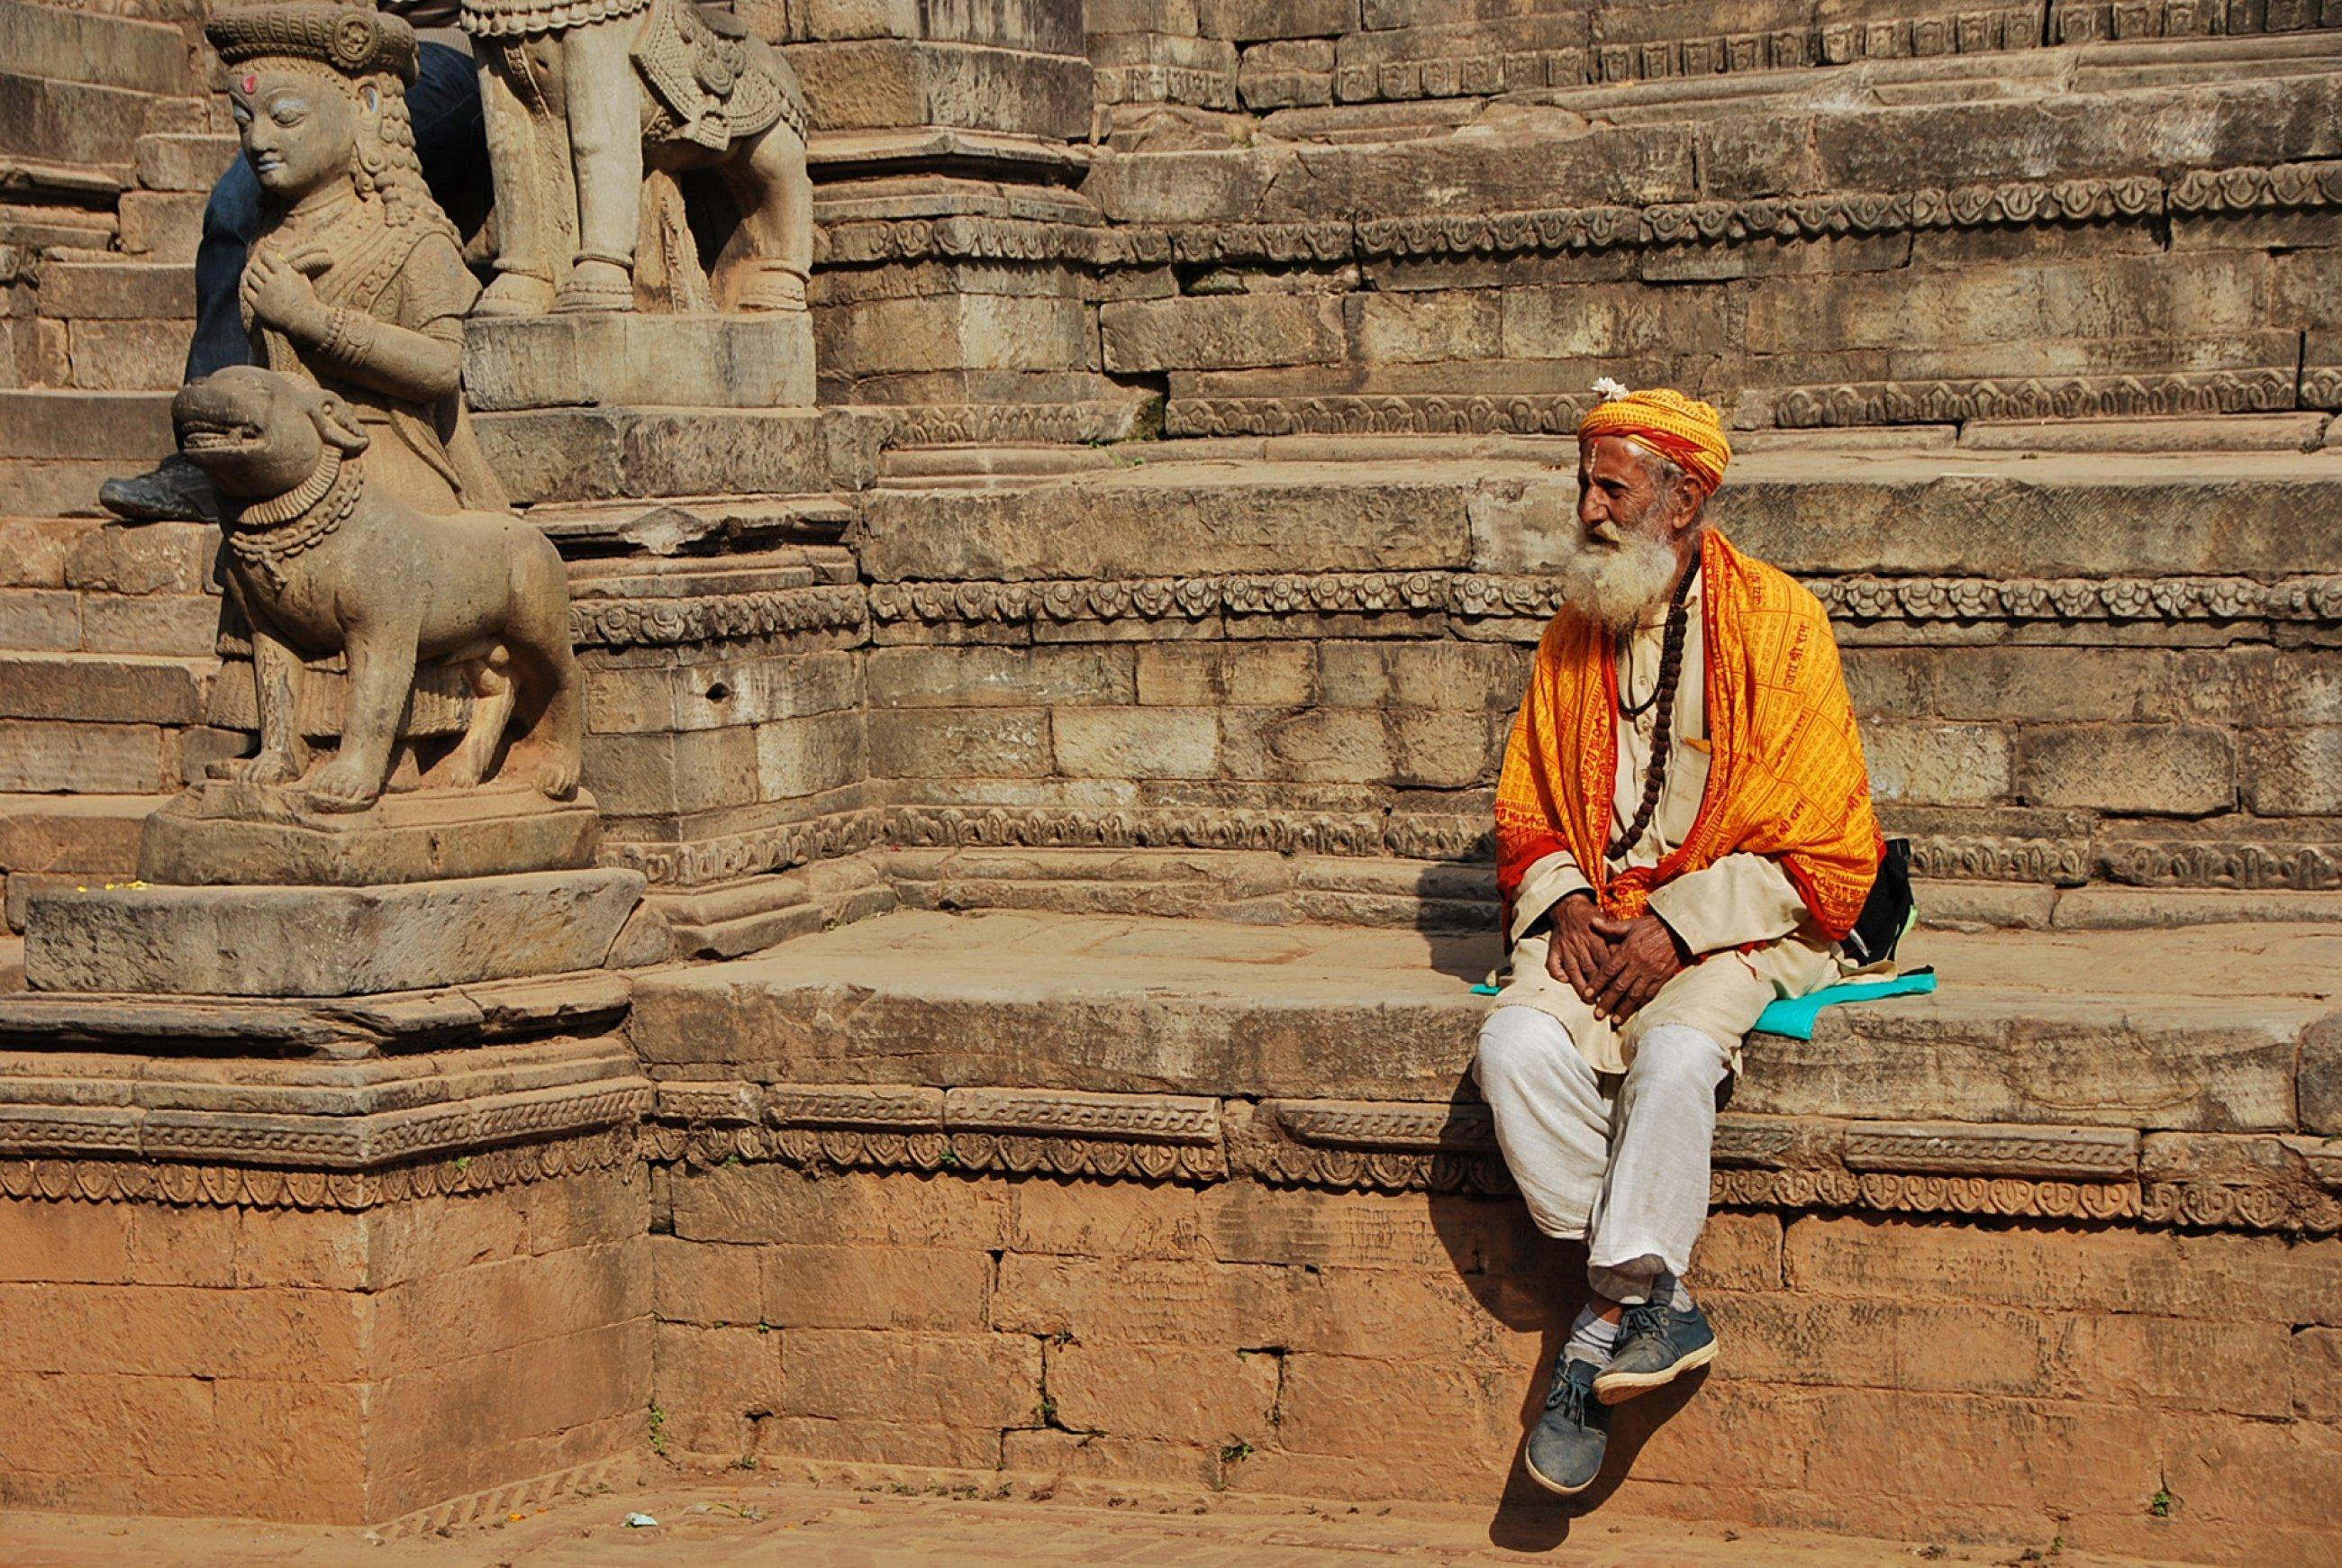 https://bubo.sk/uploads/galleries/16319/nepal-bhaktapur-mirka-sulka.jpg